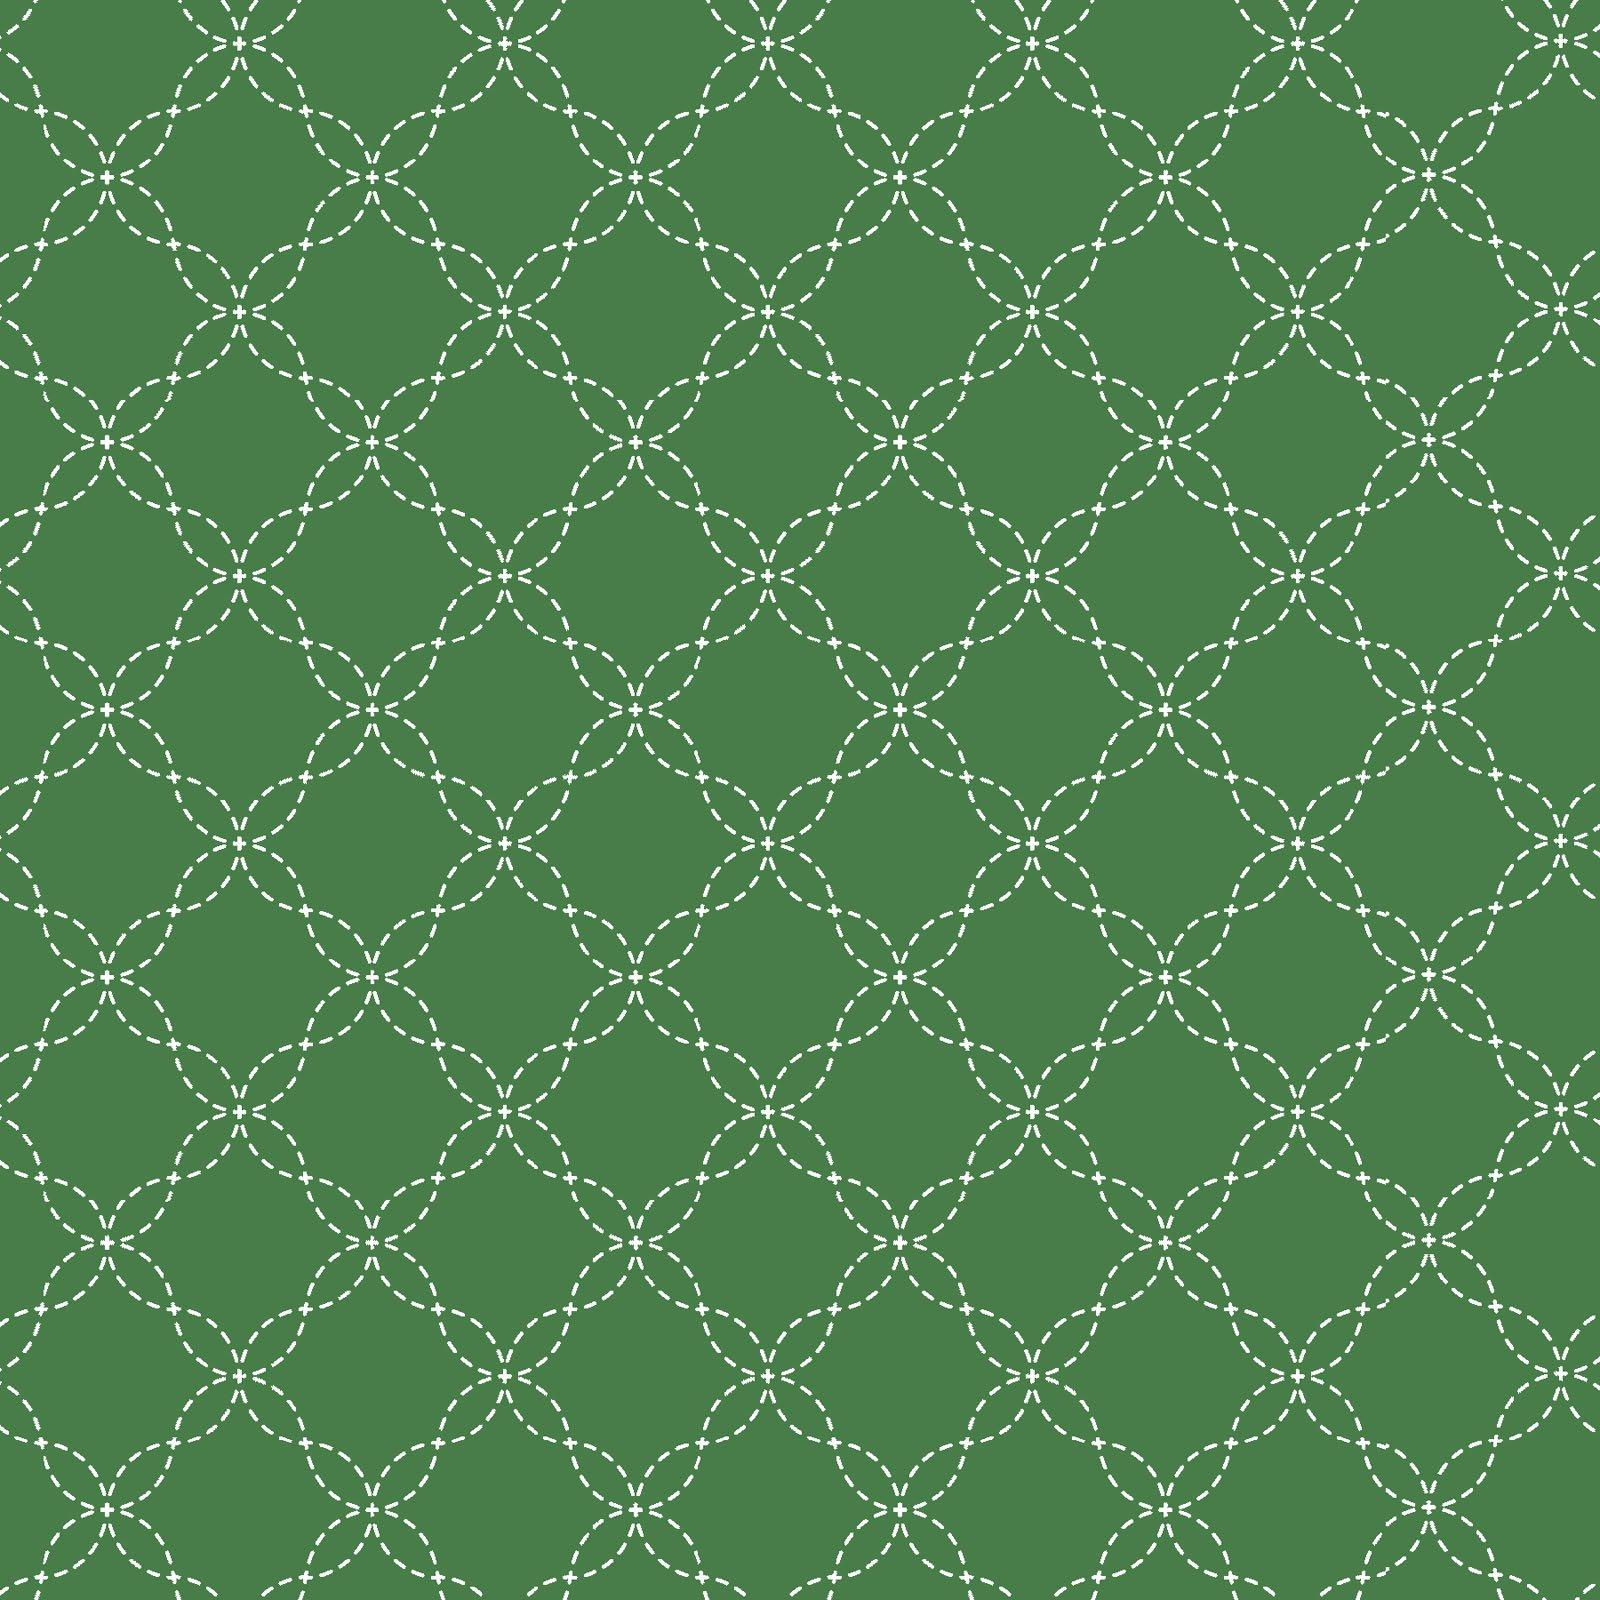 KimberBell Basics Green Latttice 8209M-G2